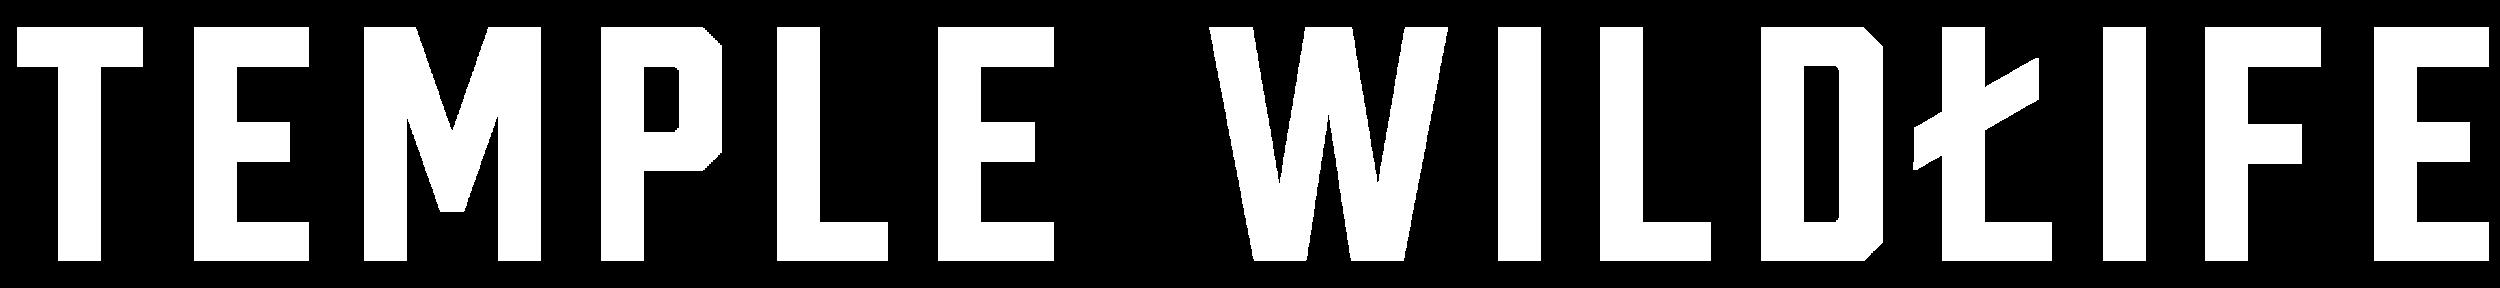 Longform logo white